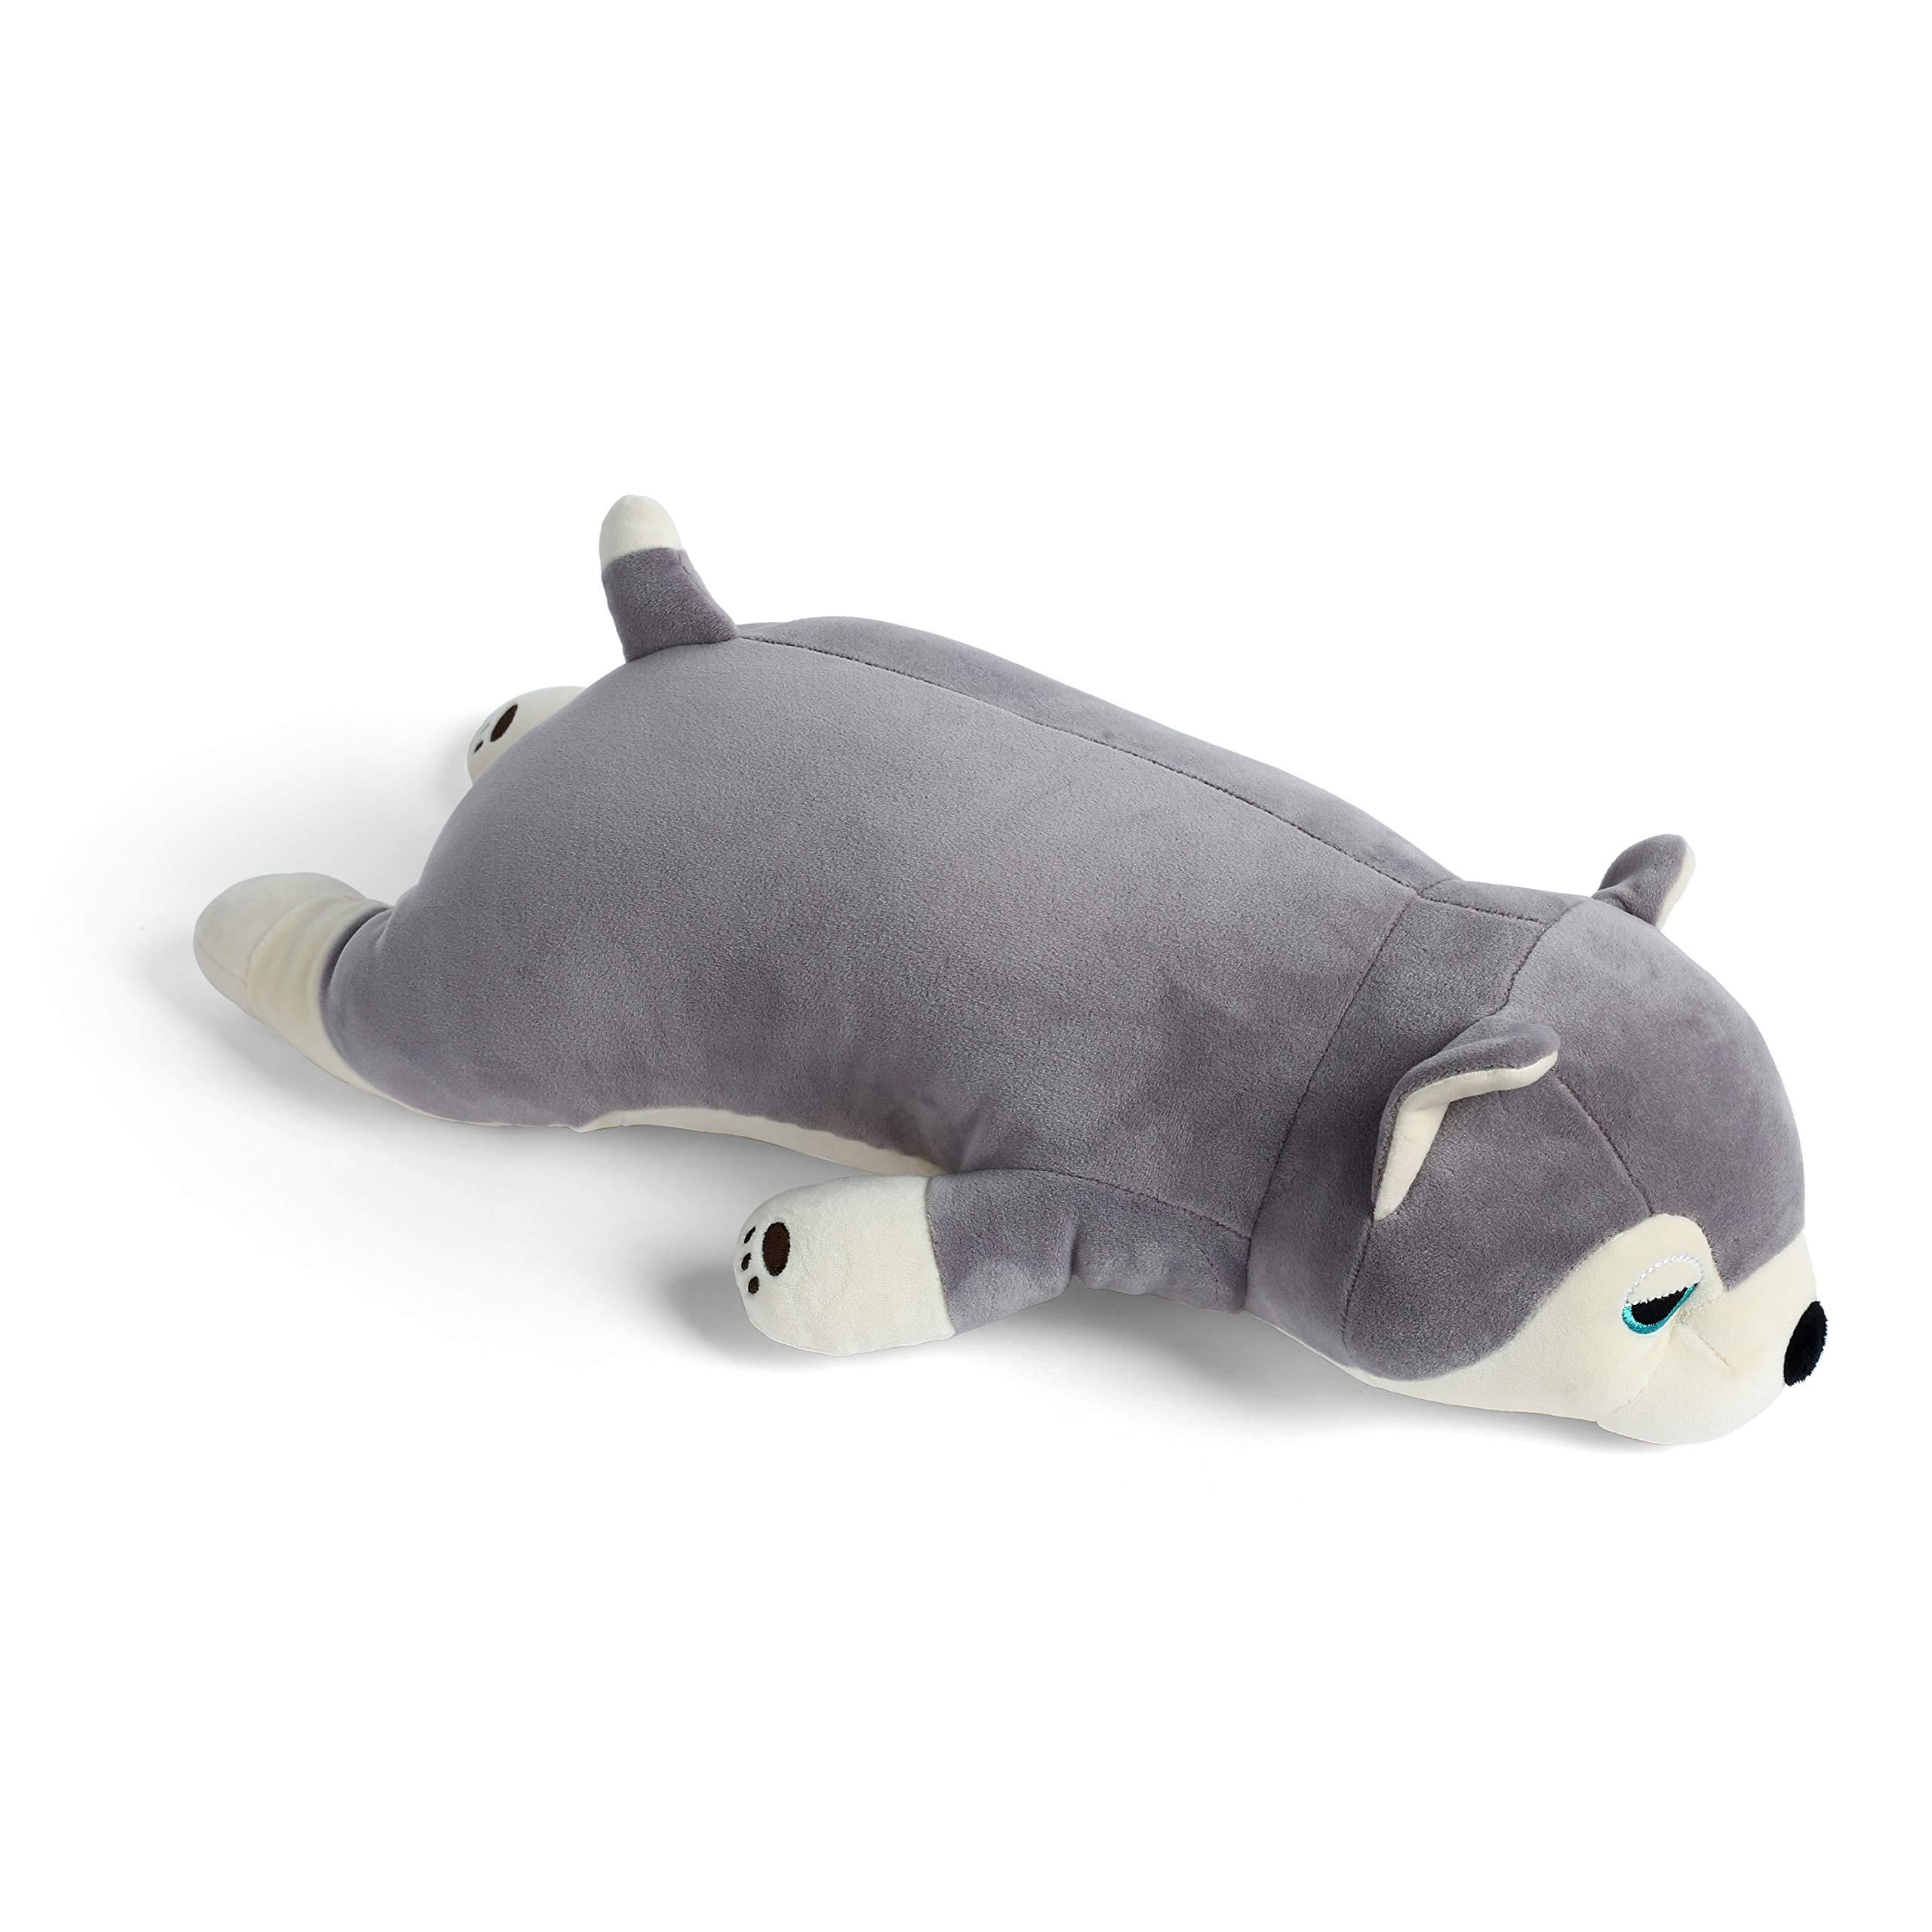 meowtastic Husky Plush Pillow Toy Stuffed Animal Puppy Throw Pillow Baby Boy Girl Pet 20 Inches